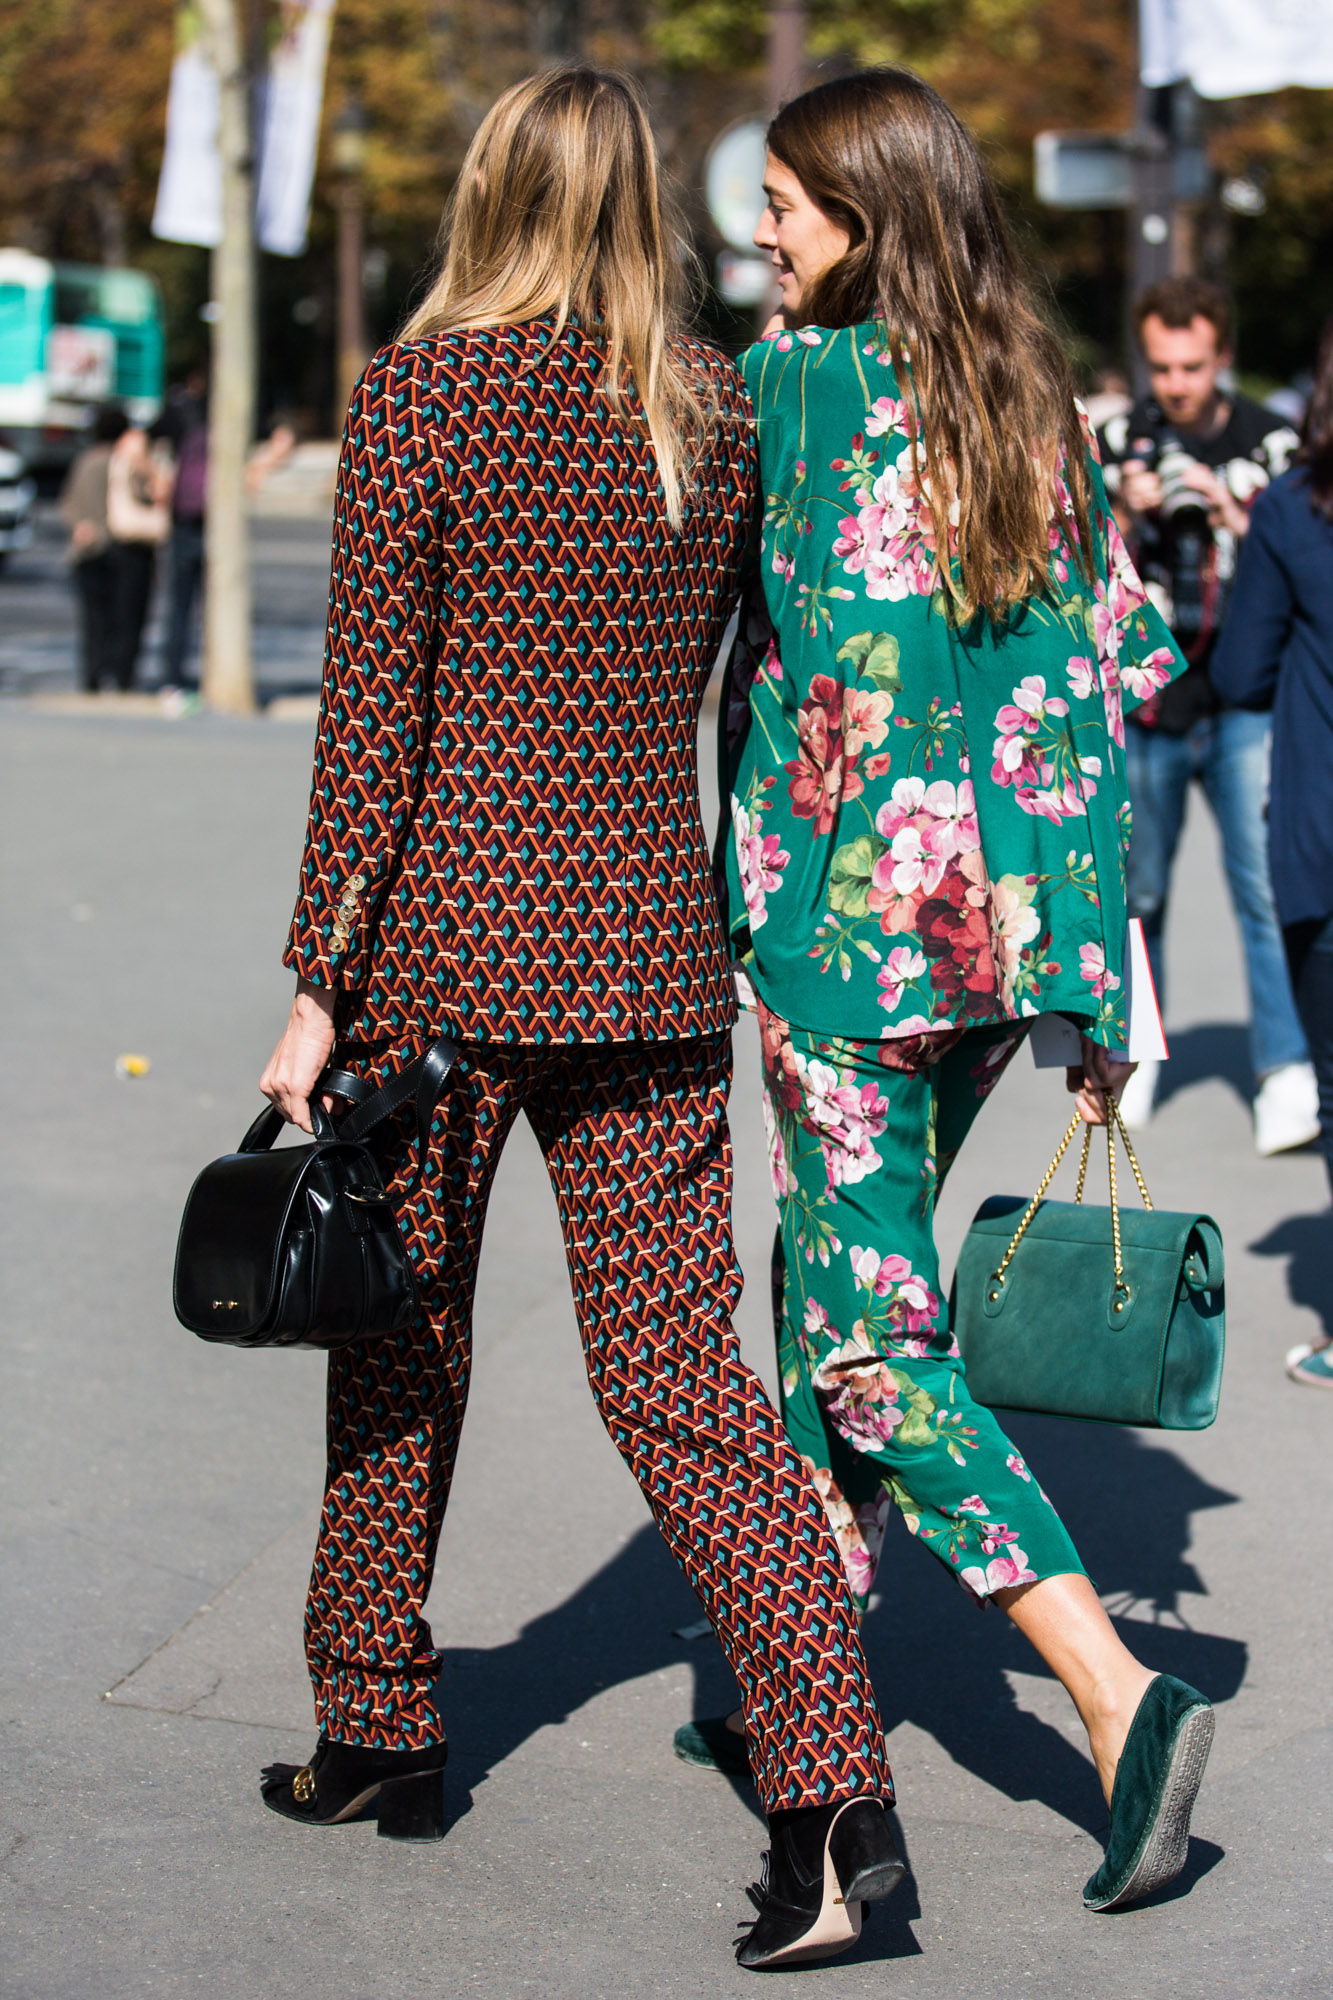 Paris Fashionweek SS 2016, day 4